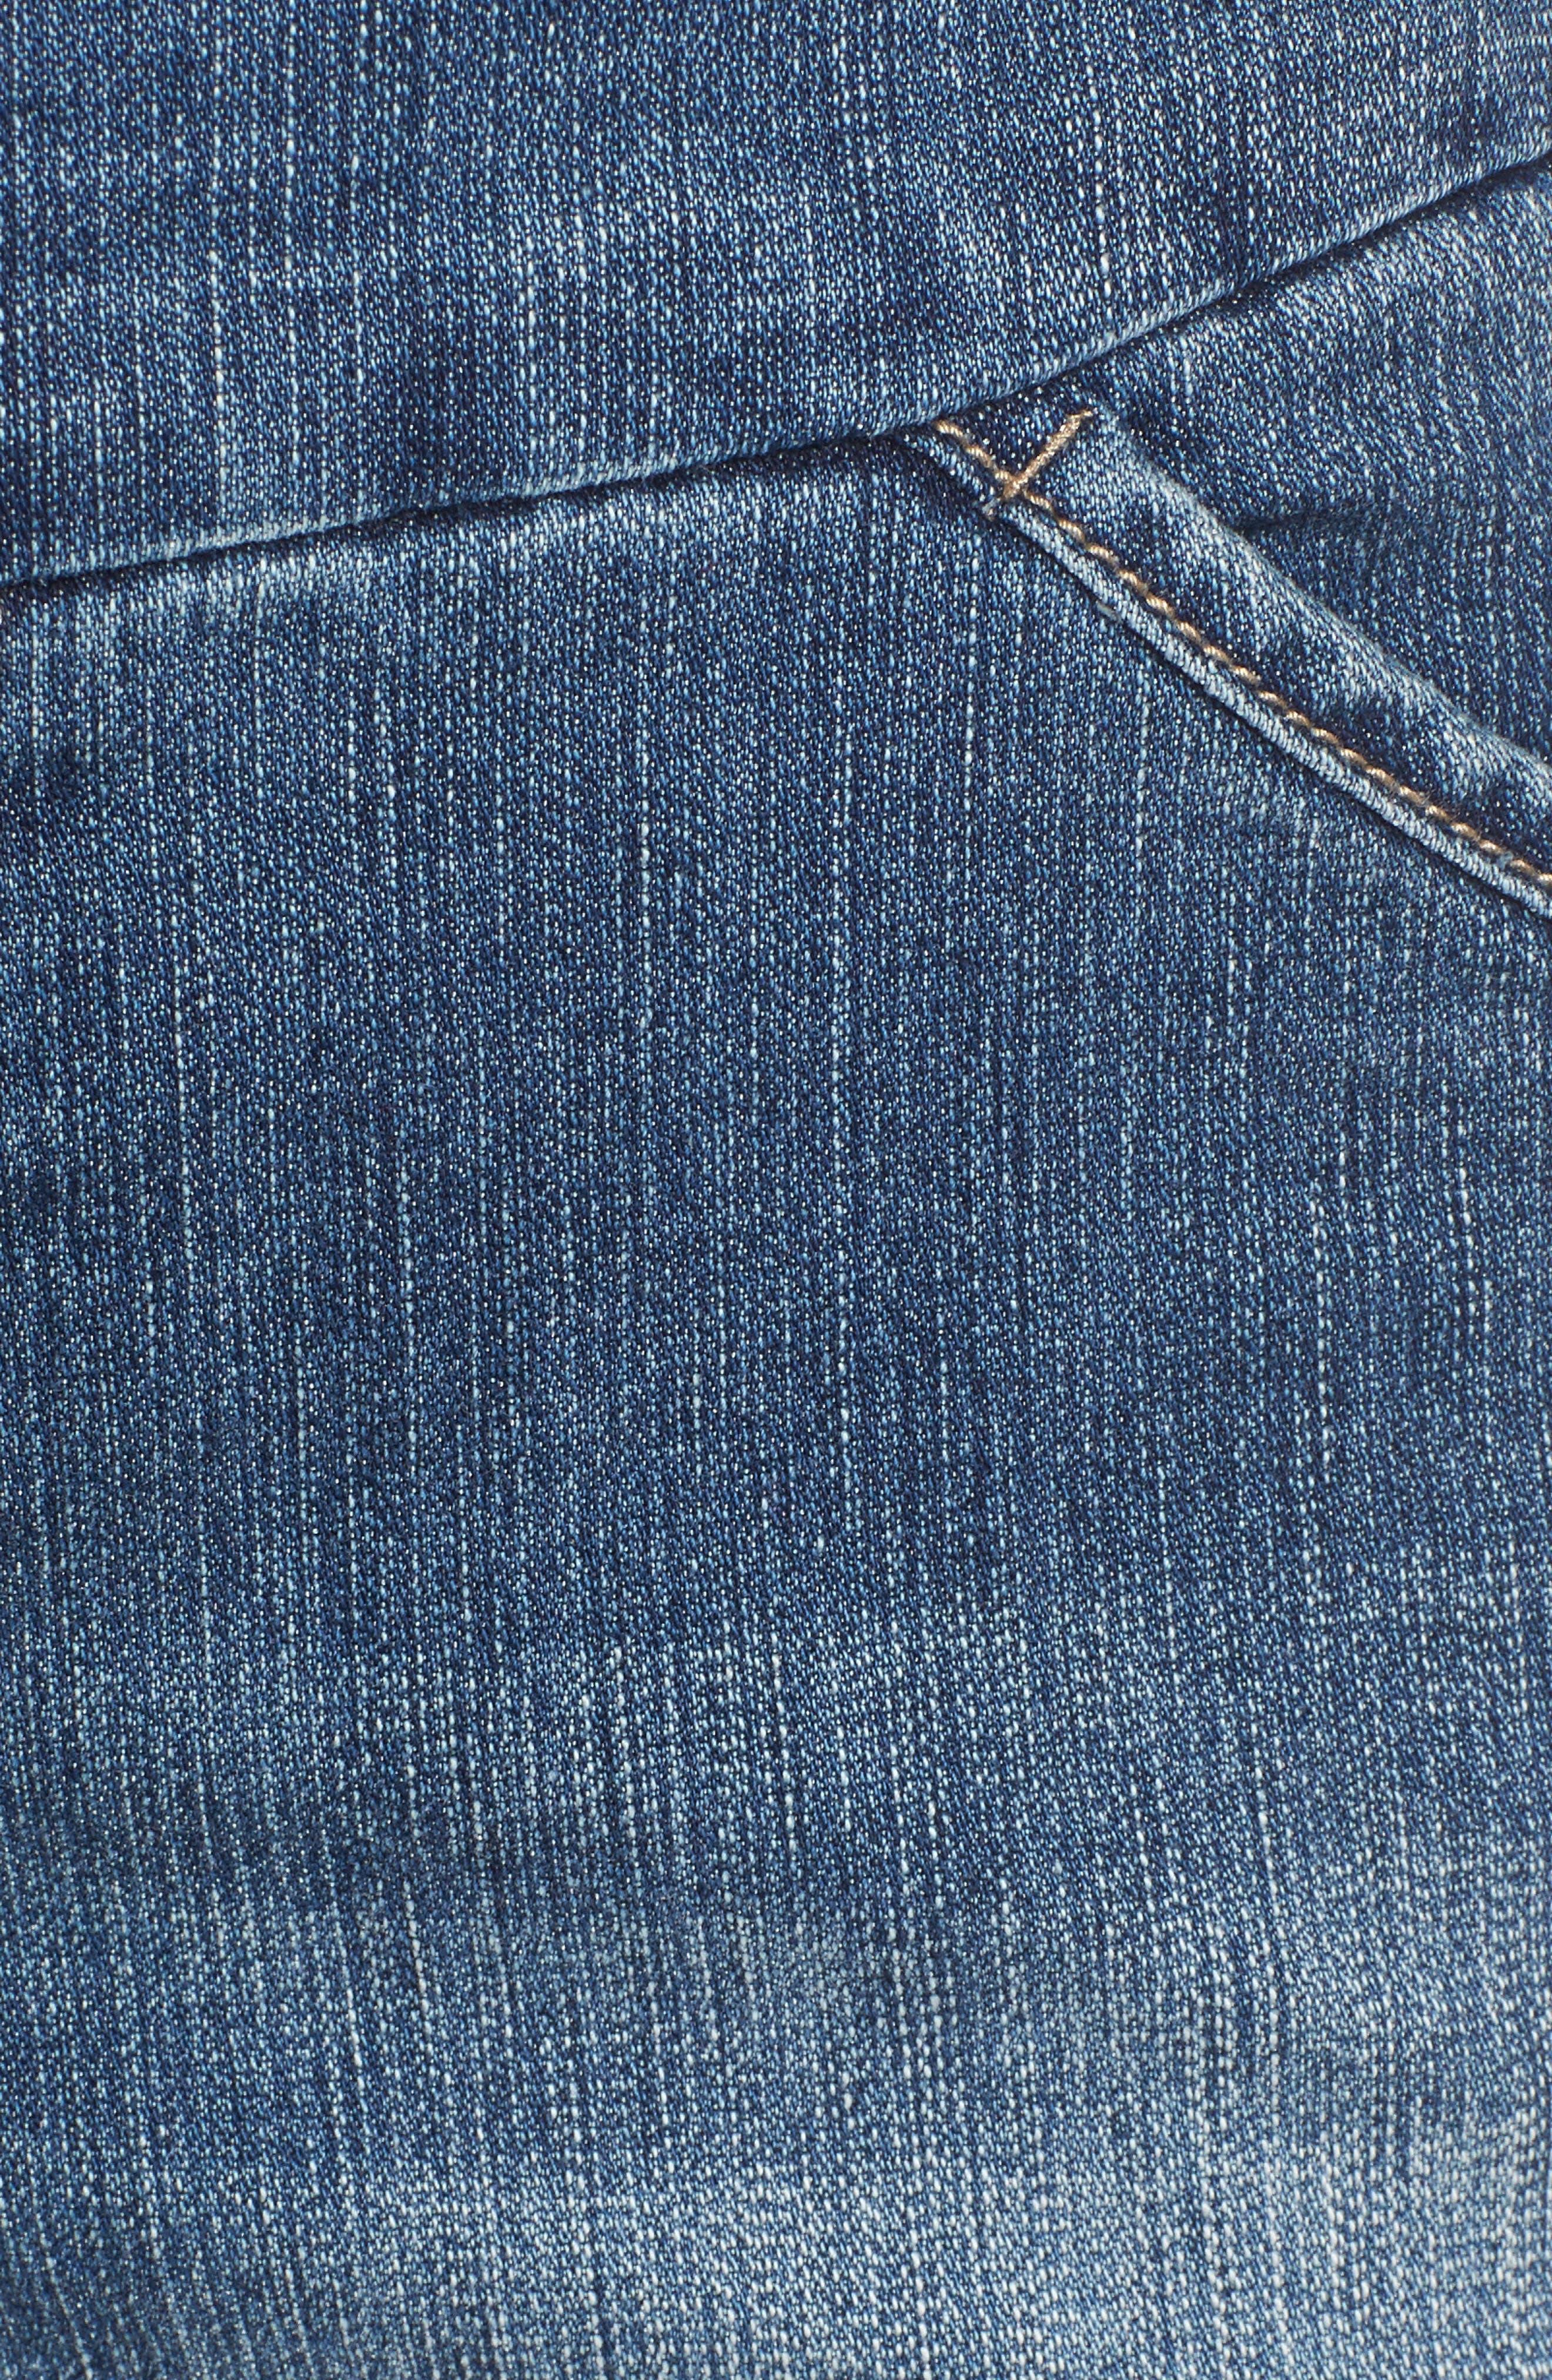 Ainsley Pull-On Denim Shorts,                             Alternate thumbnail 5, color,                             402